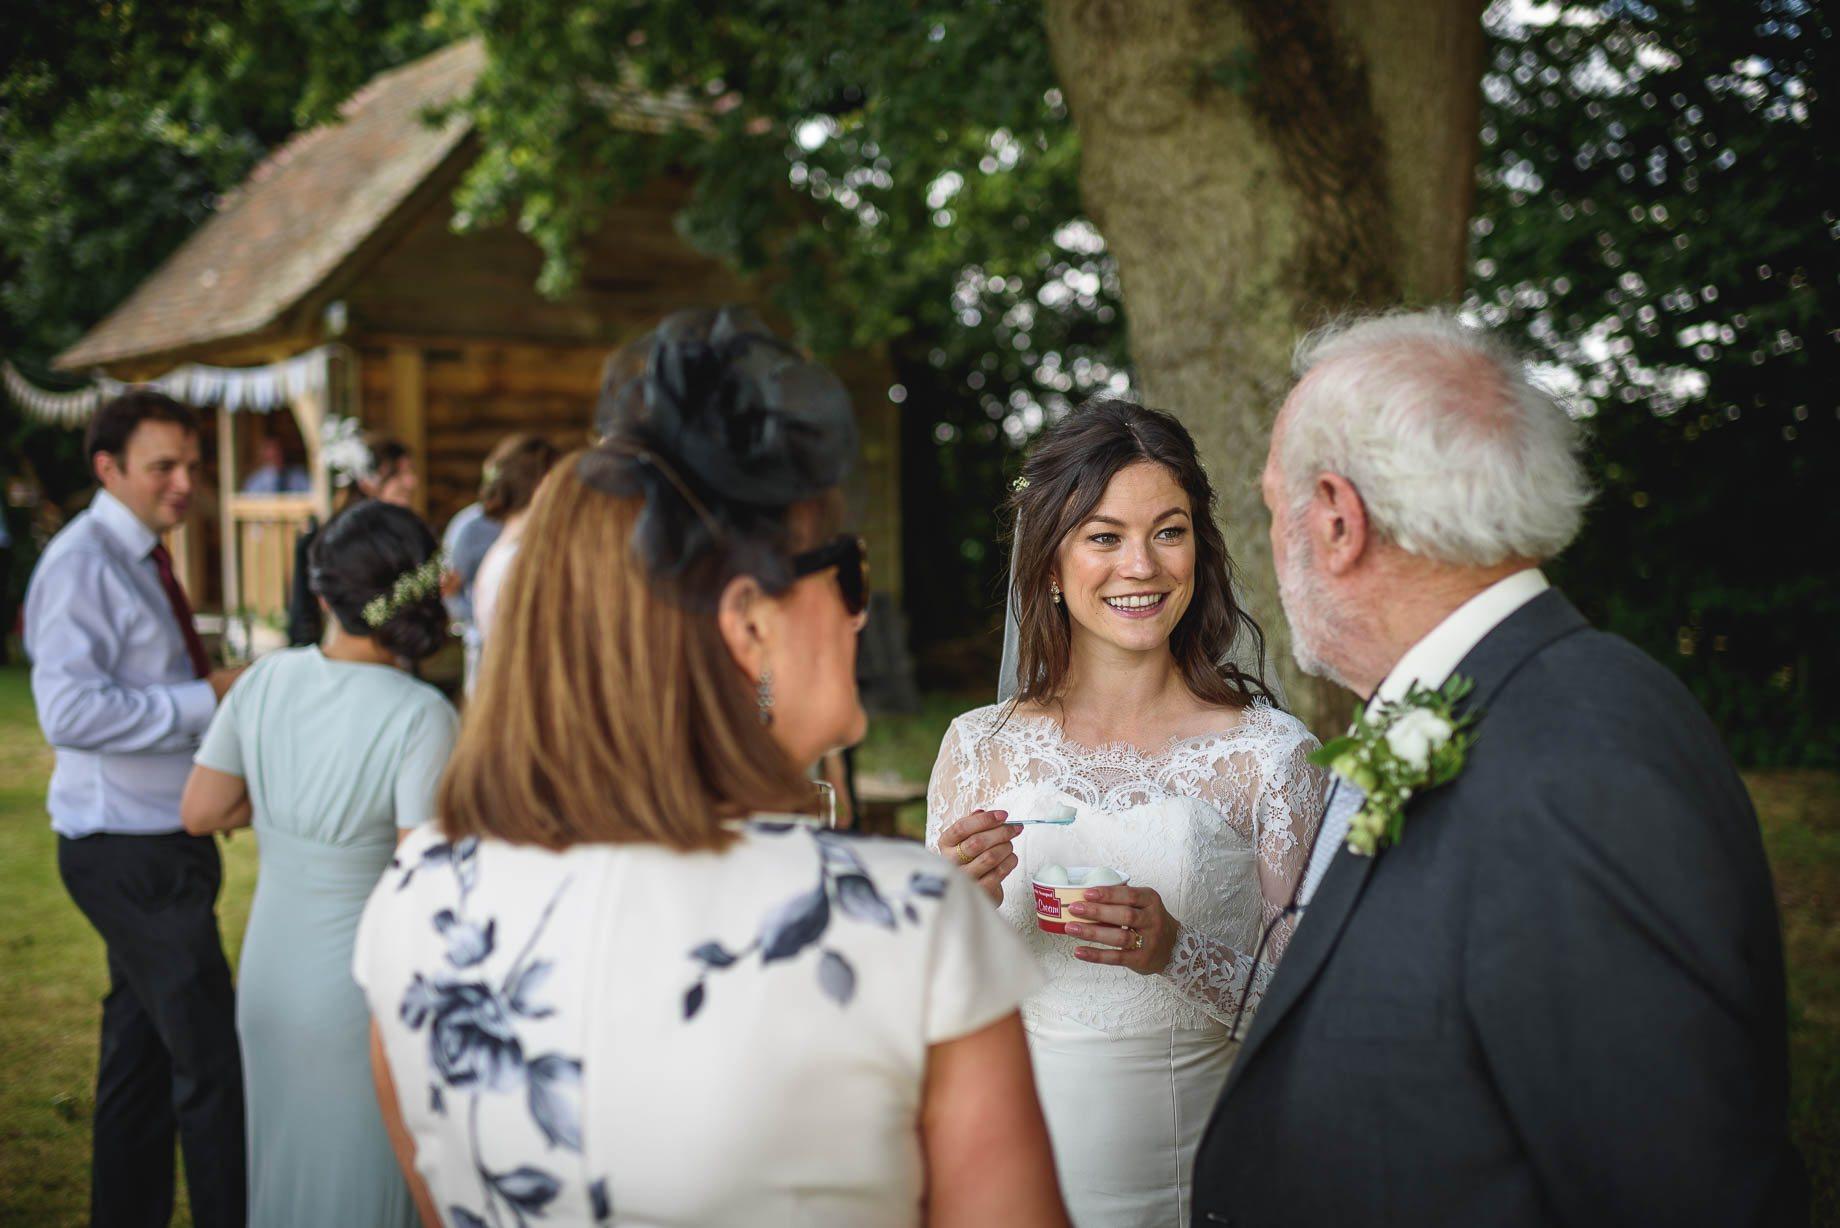 Gildings Barn wedding photography - Sarah and Steve (110 of 190)